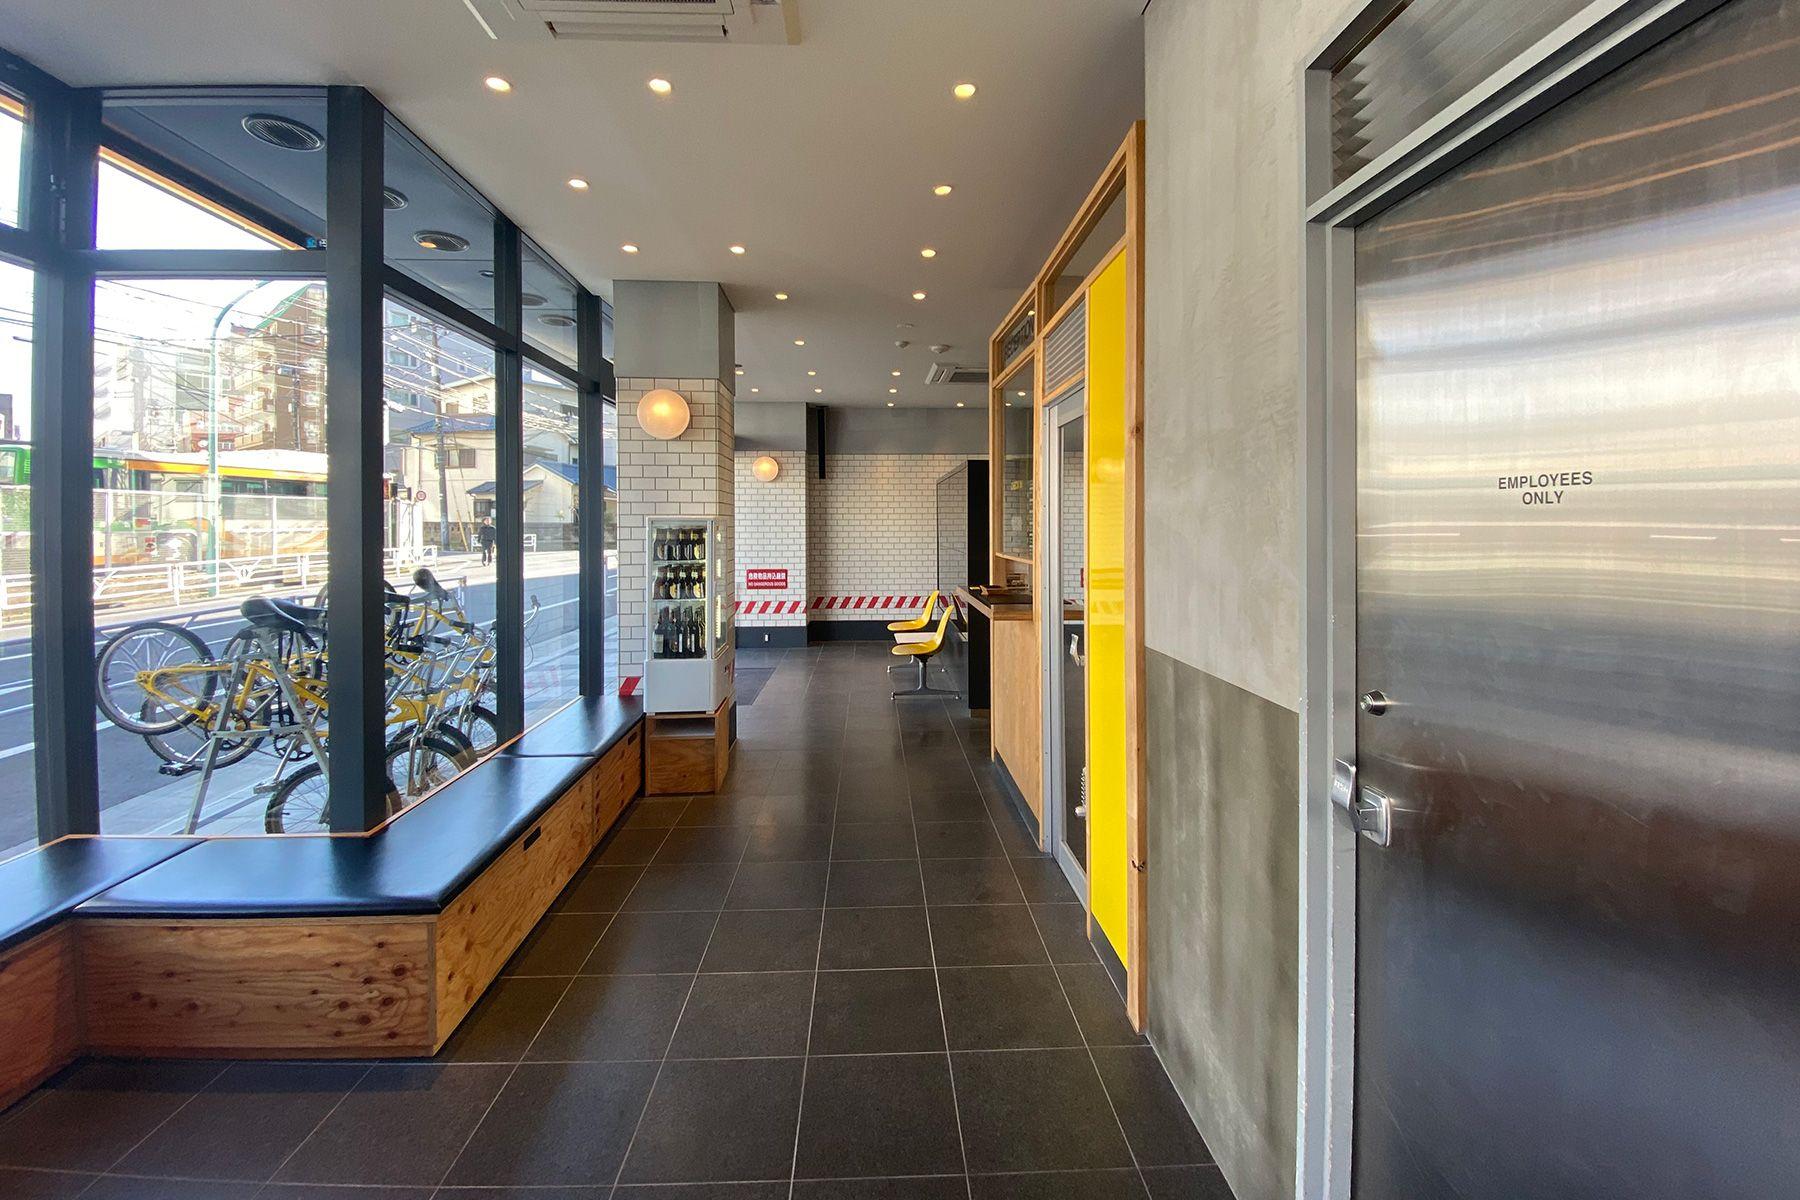 MUSTARD™️ HOTEL SHIBUYA (マスタードホテル シブヤ)1F 共用スペース